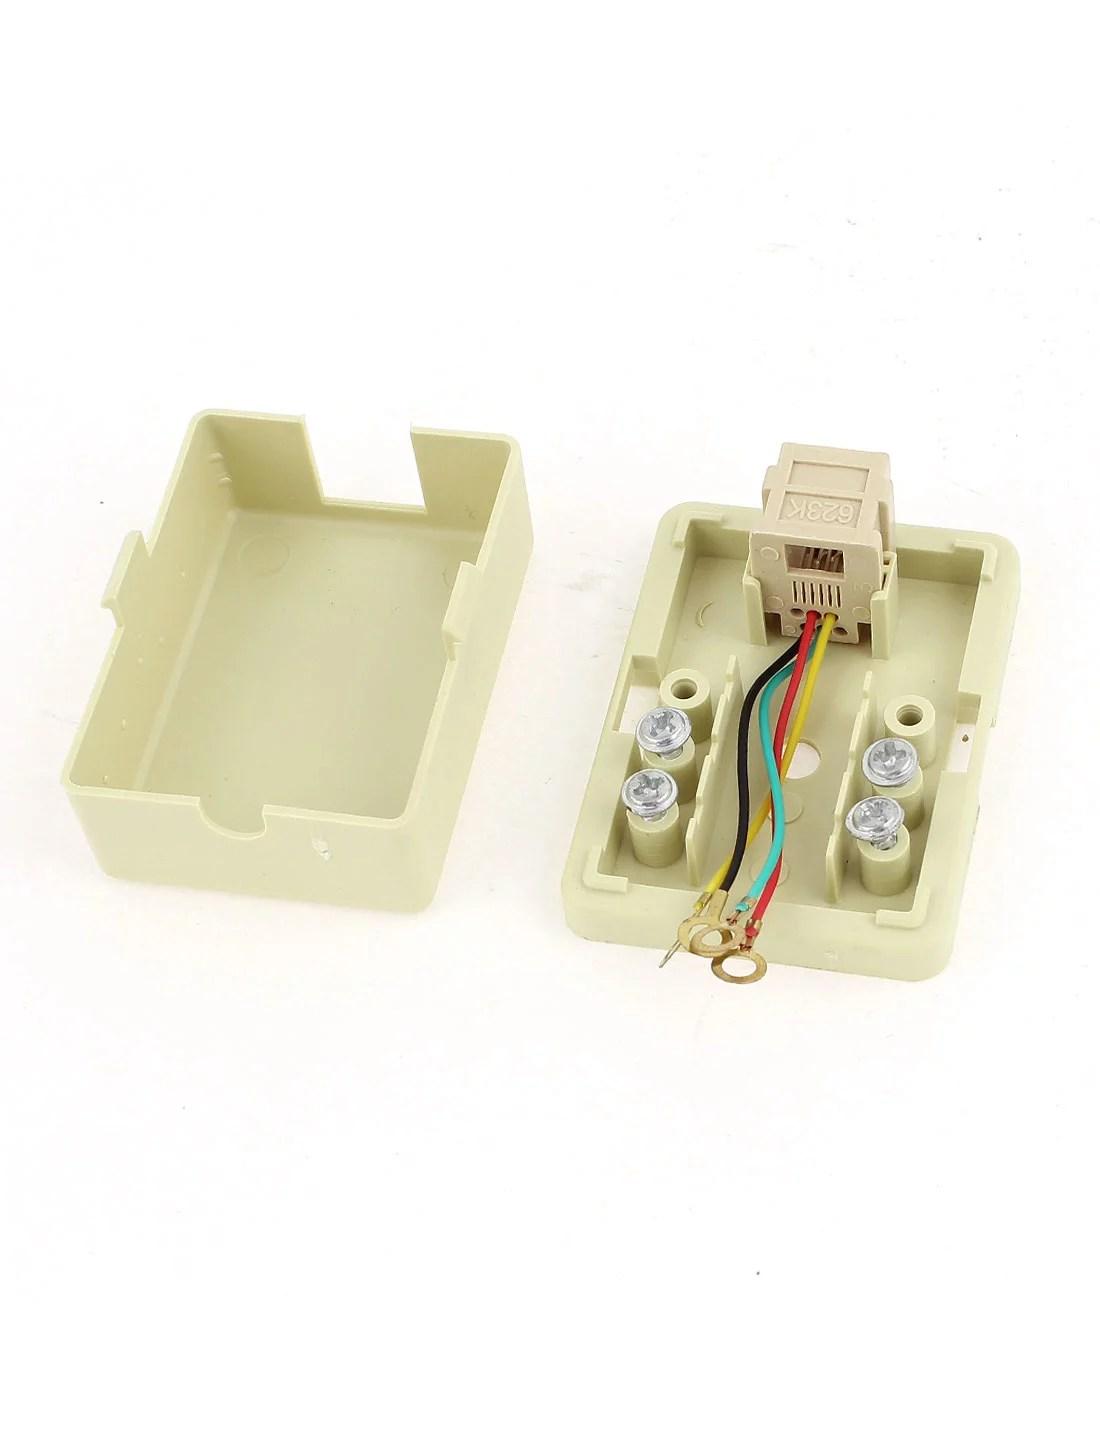 hight resolution of wall mount keystone single port telephone phone jacks 6p4c rj11 walmart canada